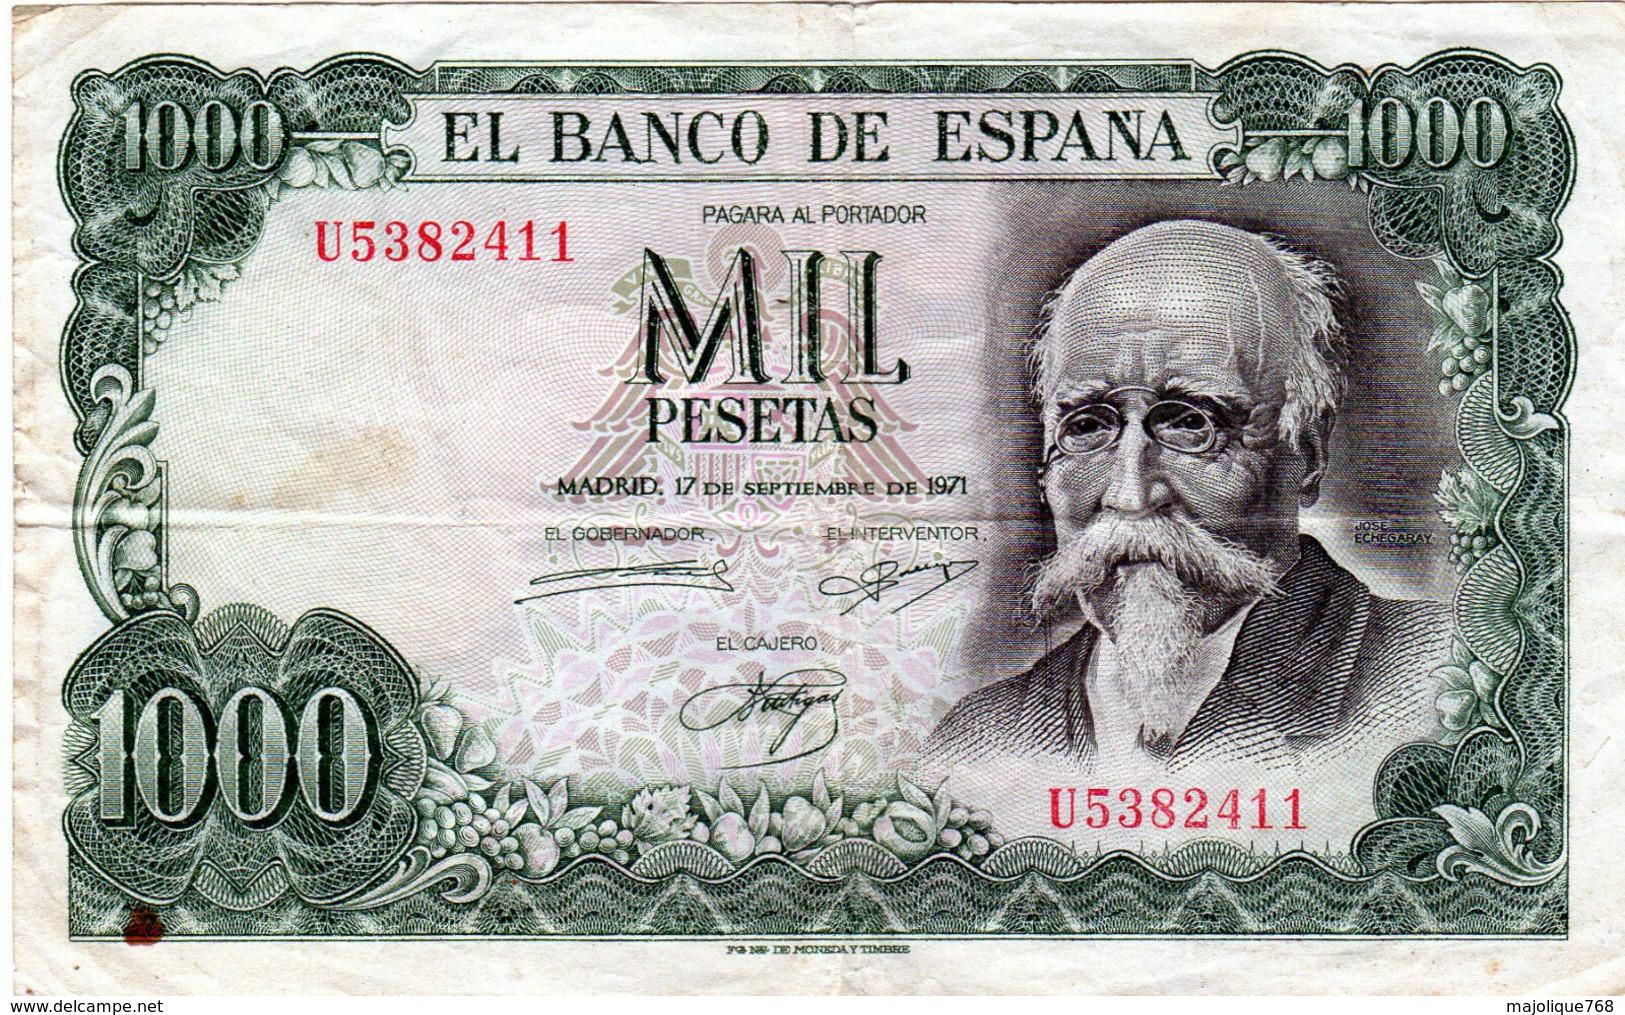 Billet De 1000 Pesetas - Espagne En T B - Le 17 Septembre 1971 - - [ 3] 1936-1975 : Regime Di Franco